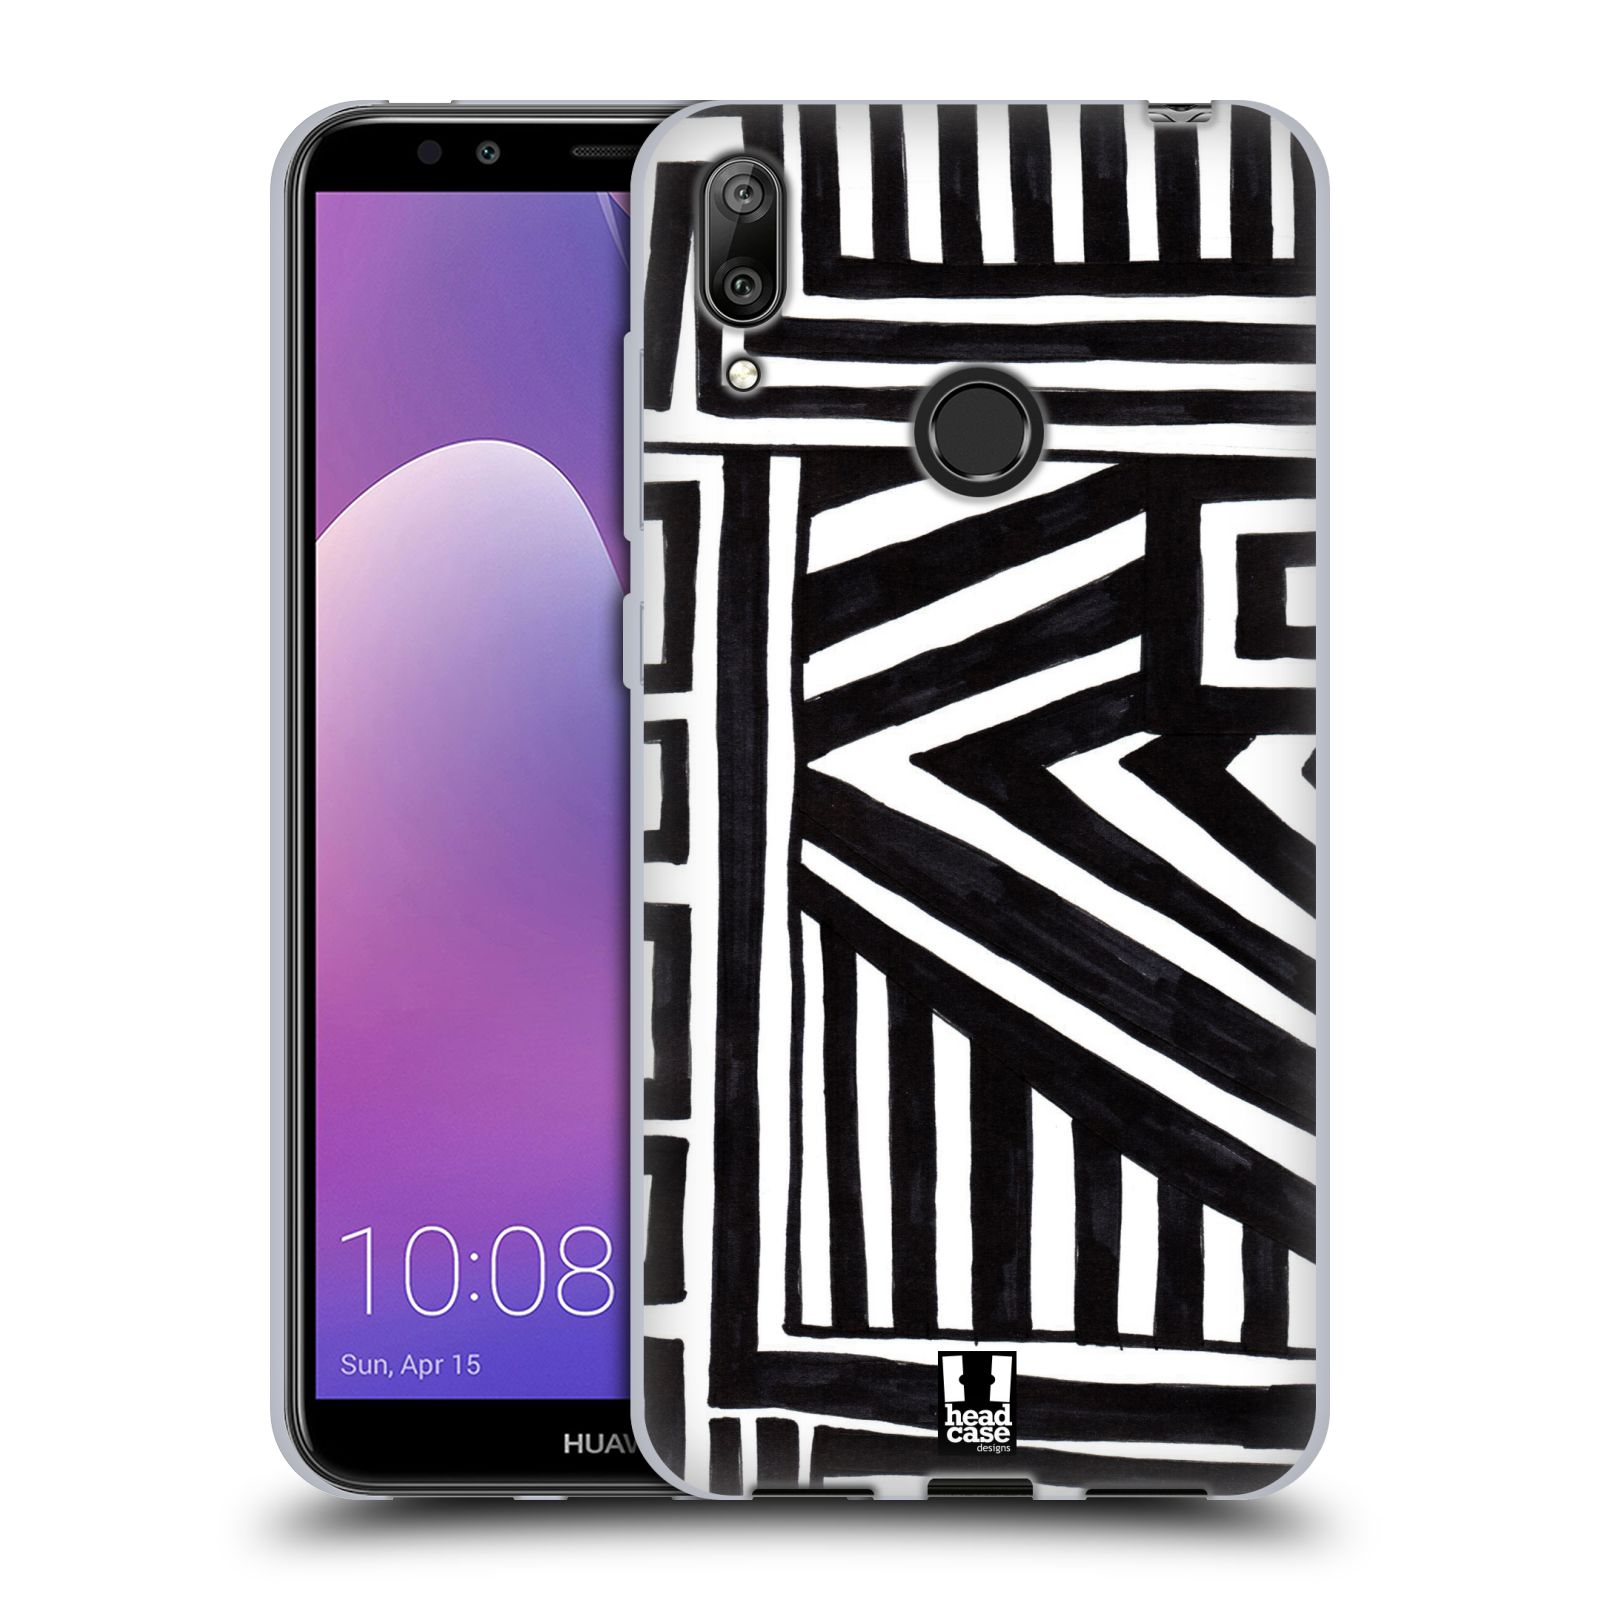 Silikonové pouzdro na mobil Huawei Y7 (2019) - Head Case - DOODLE GEOMETRIC